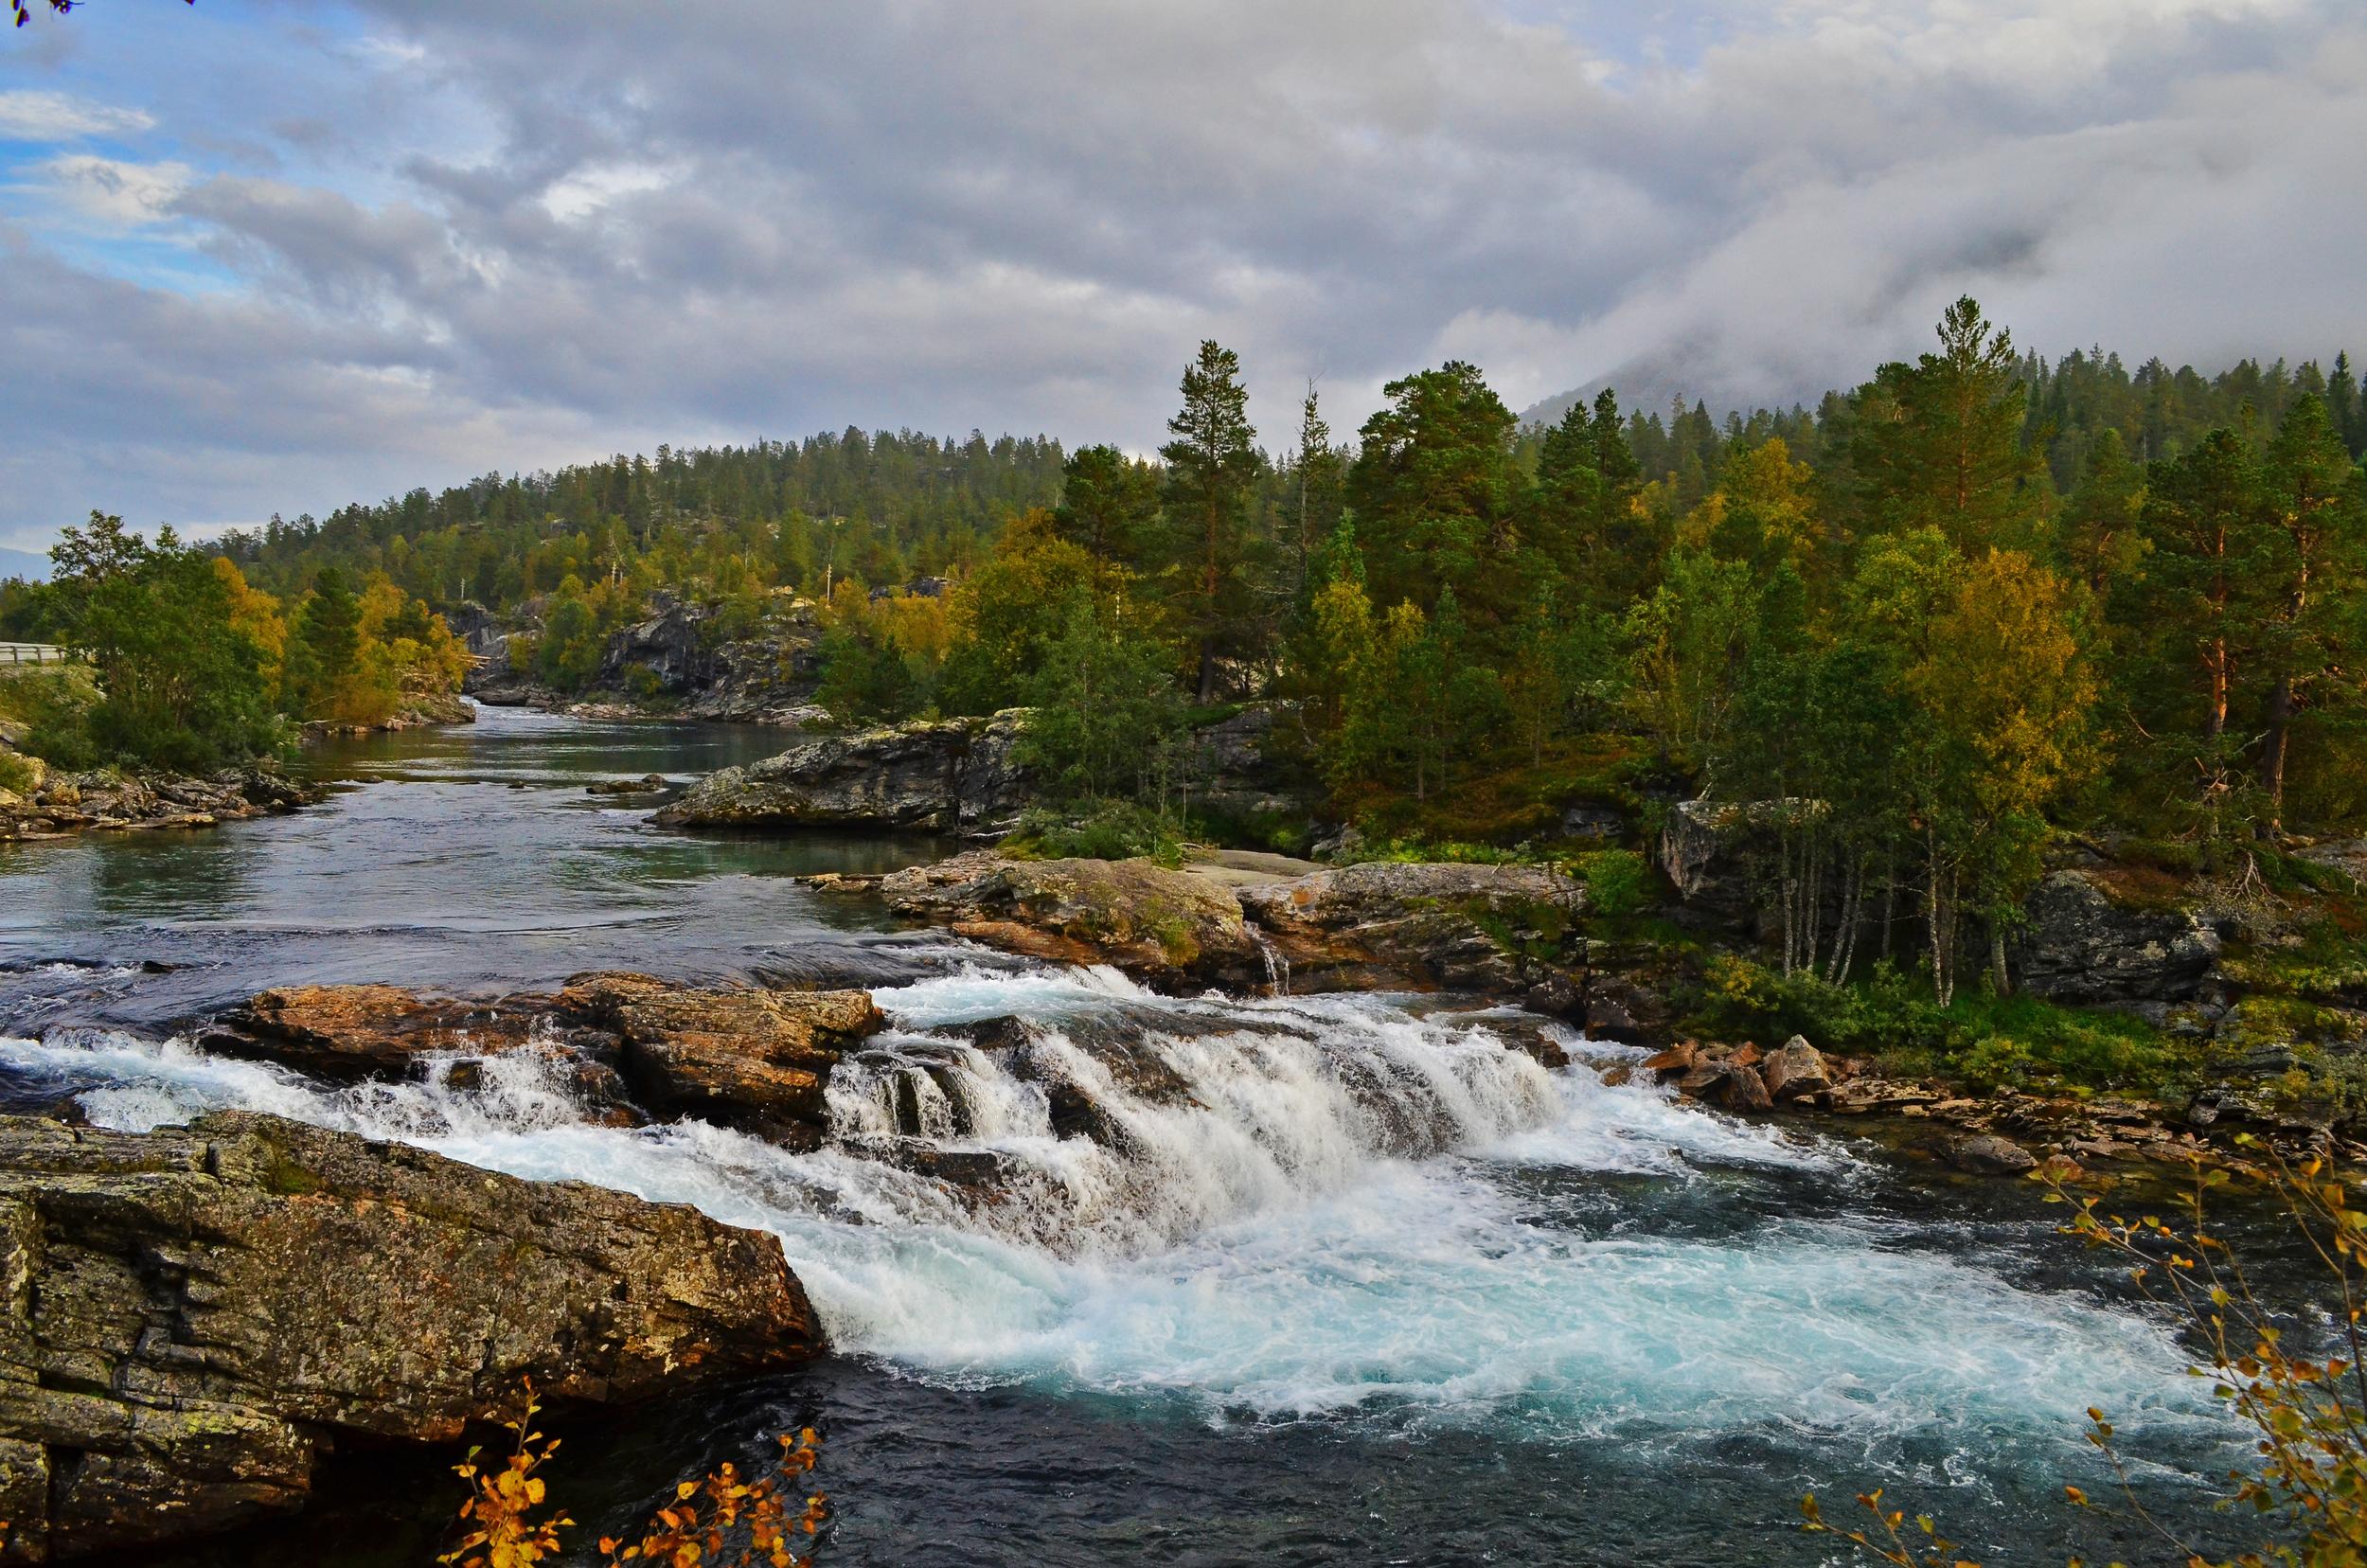 Norwegian Rivers in the Fall.